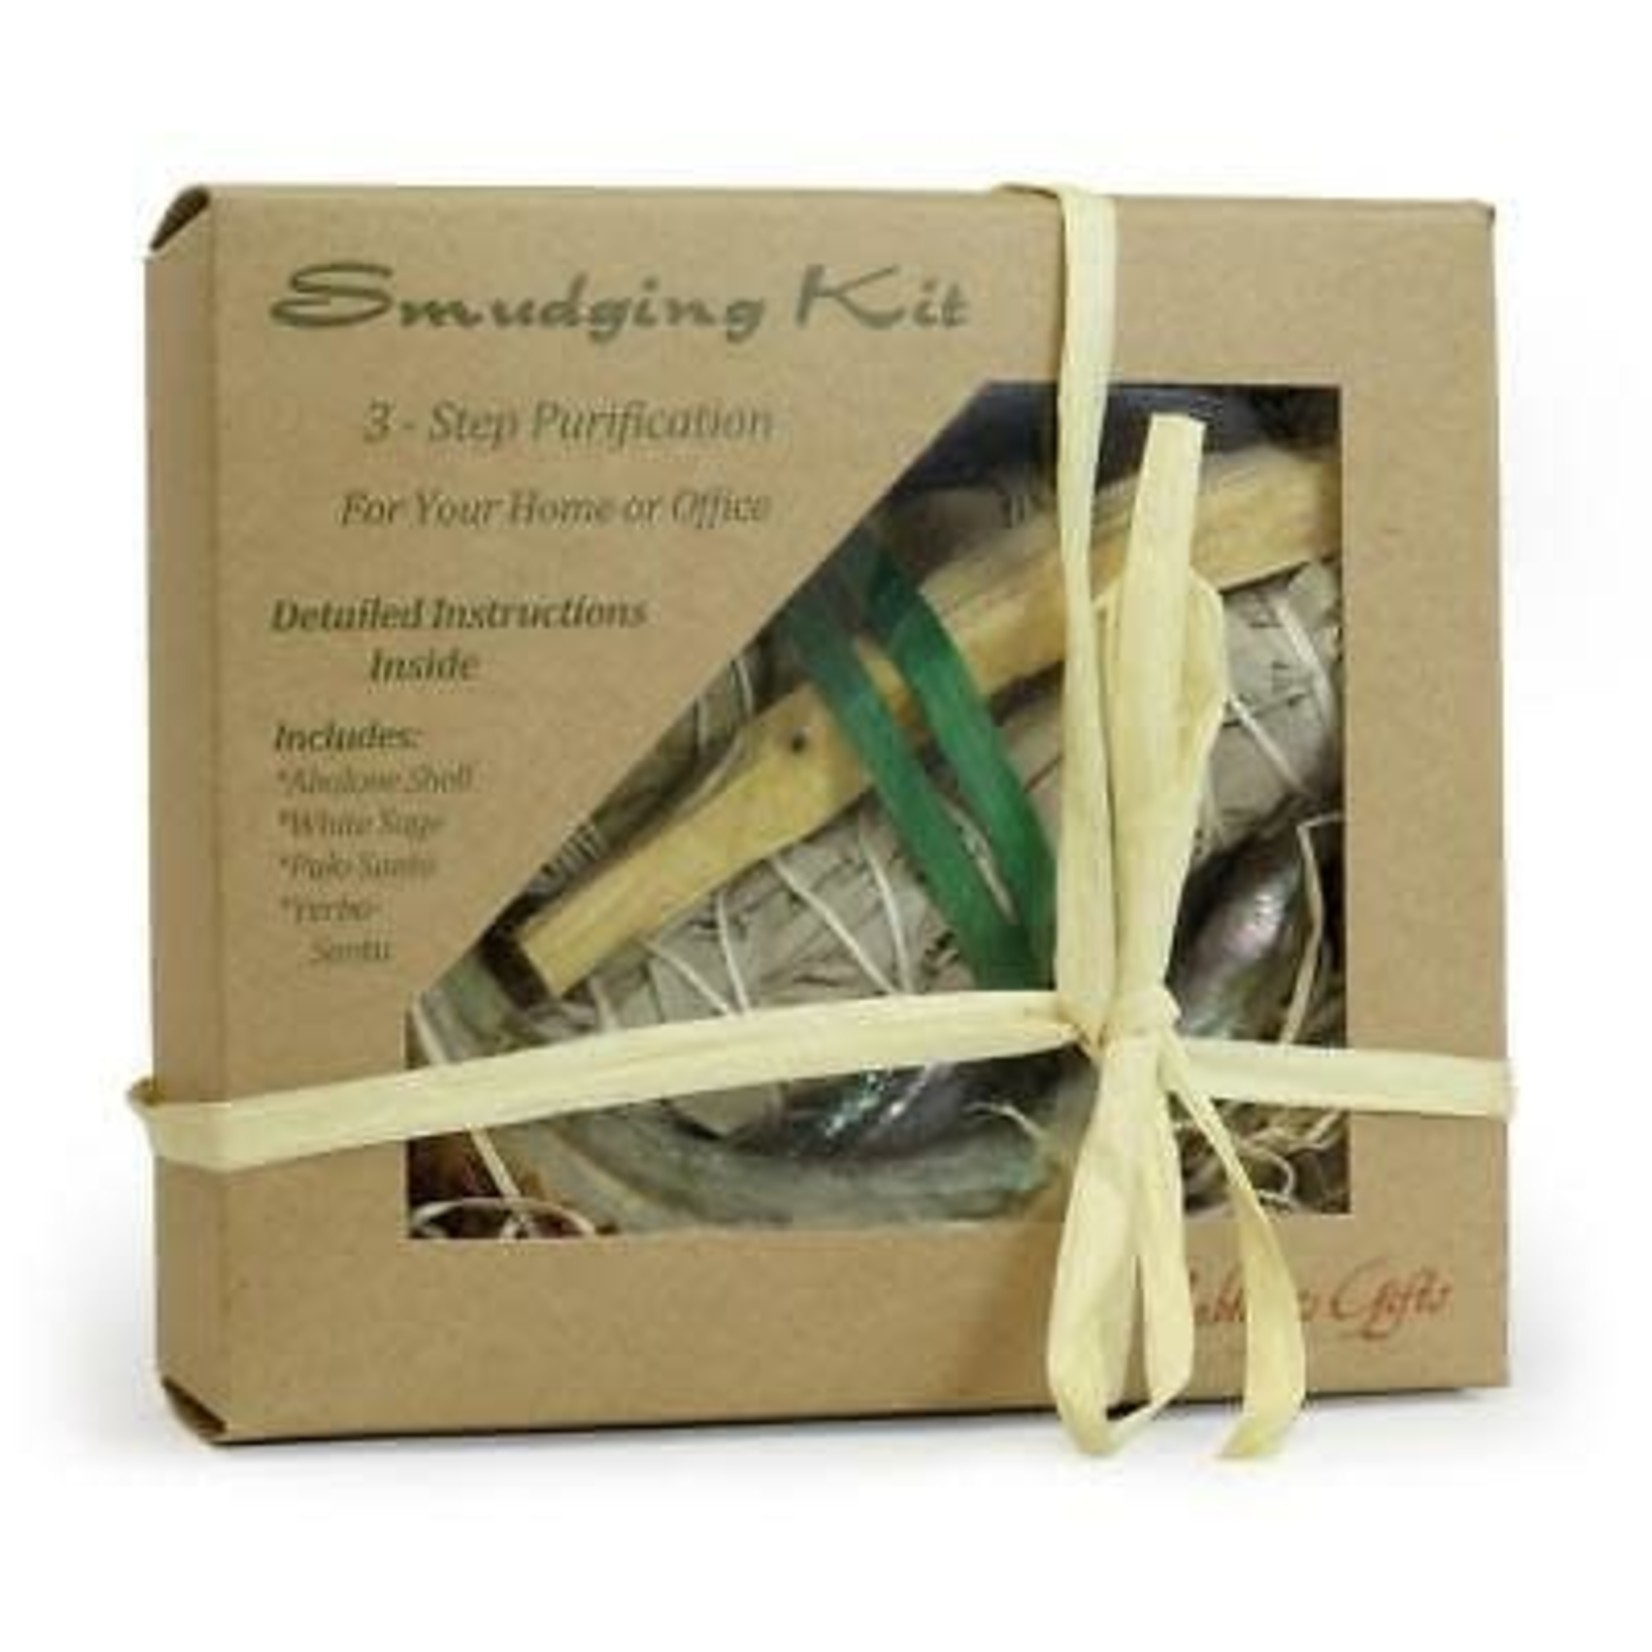 Prabhujis Gifts Smudging Kit Palo Santo - Sage - Yerba Santa - Abalone Shell - With Booklet